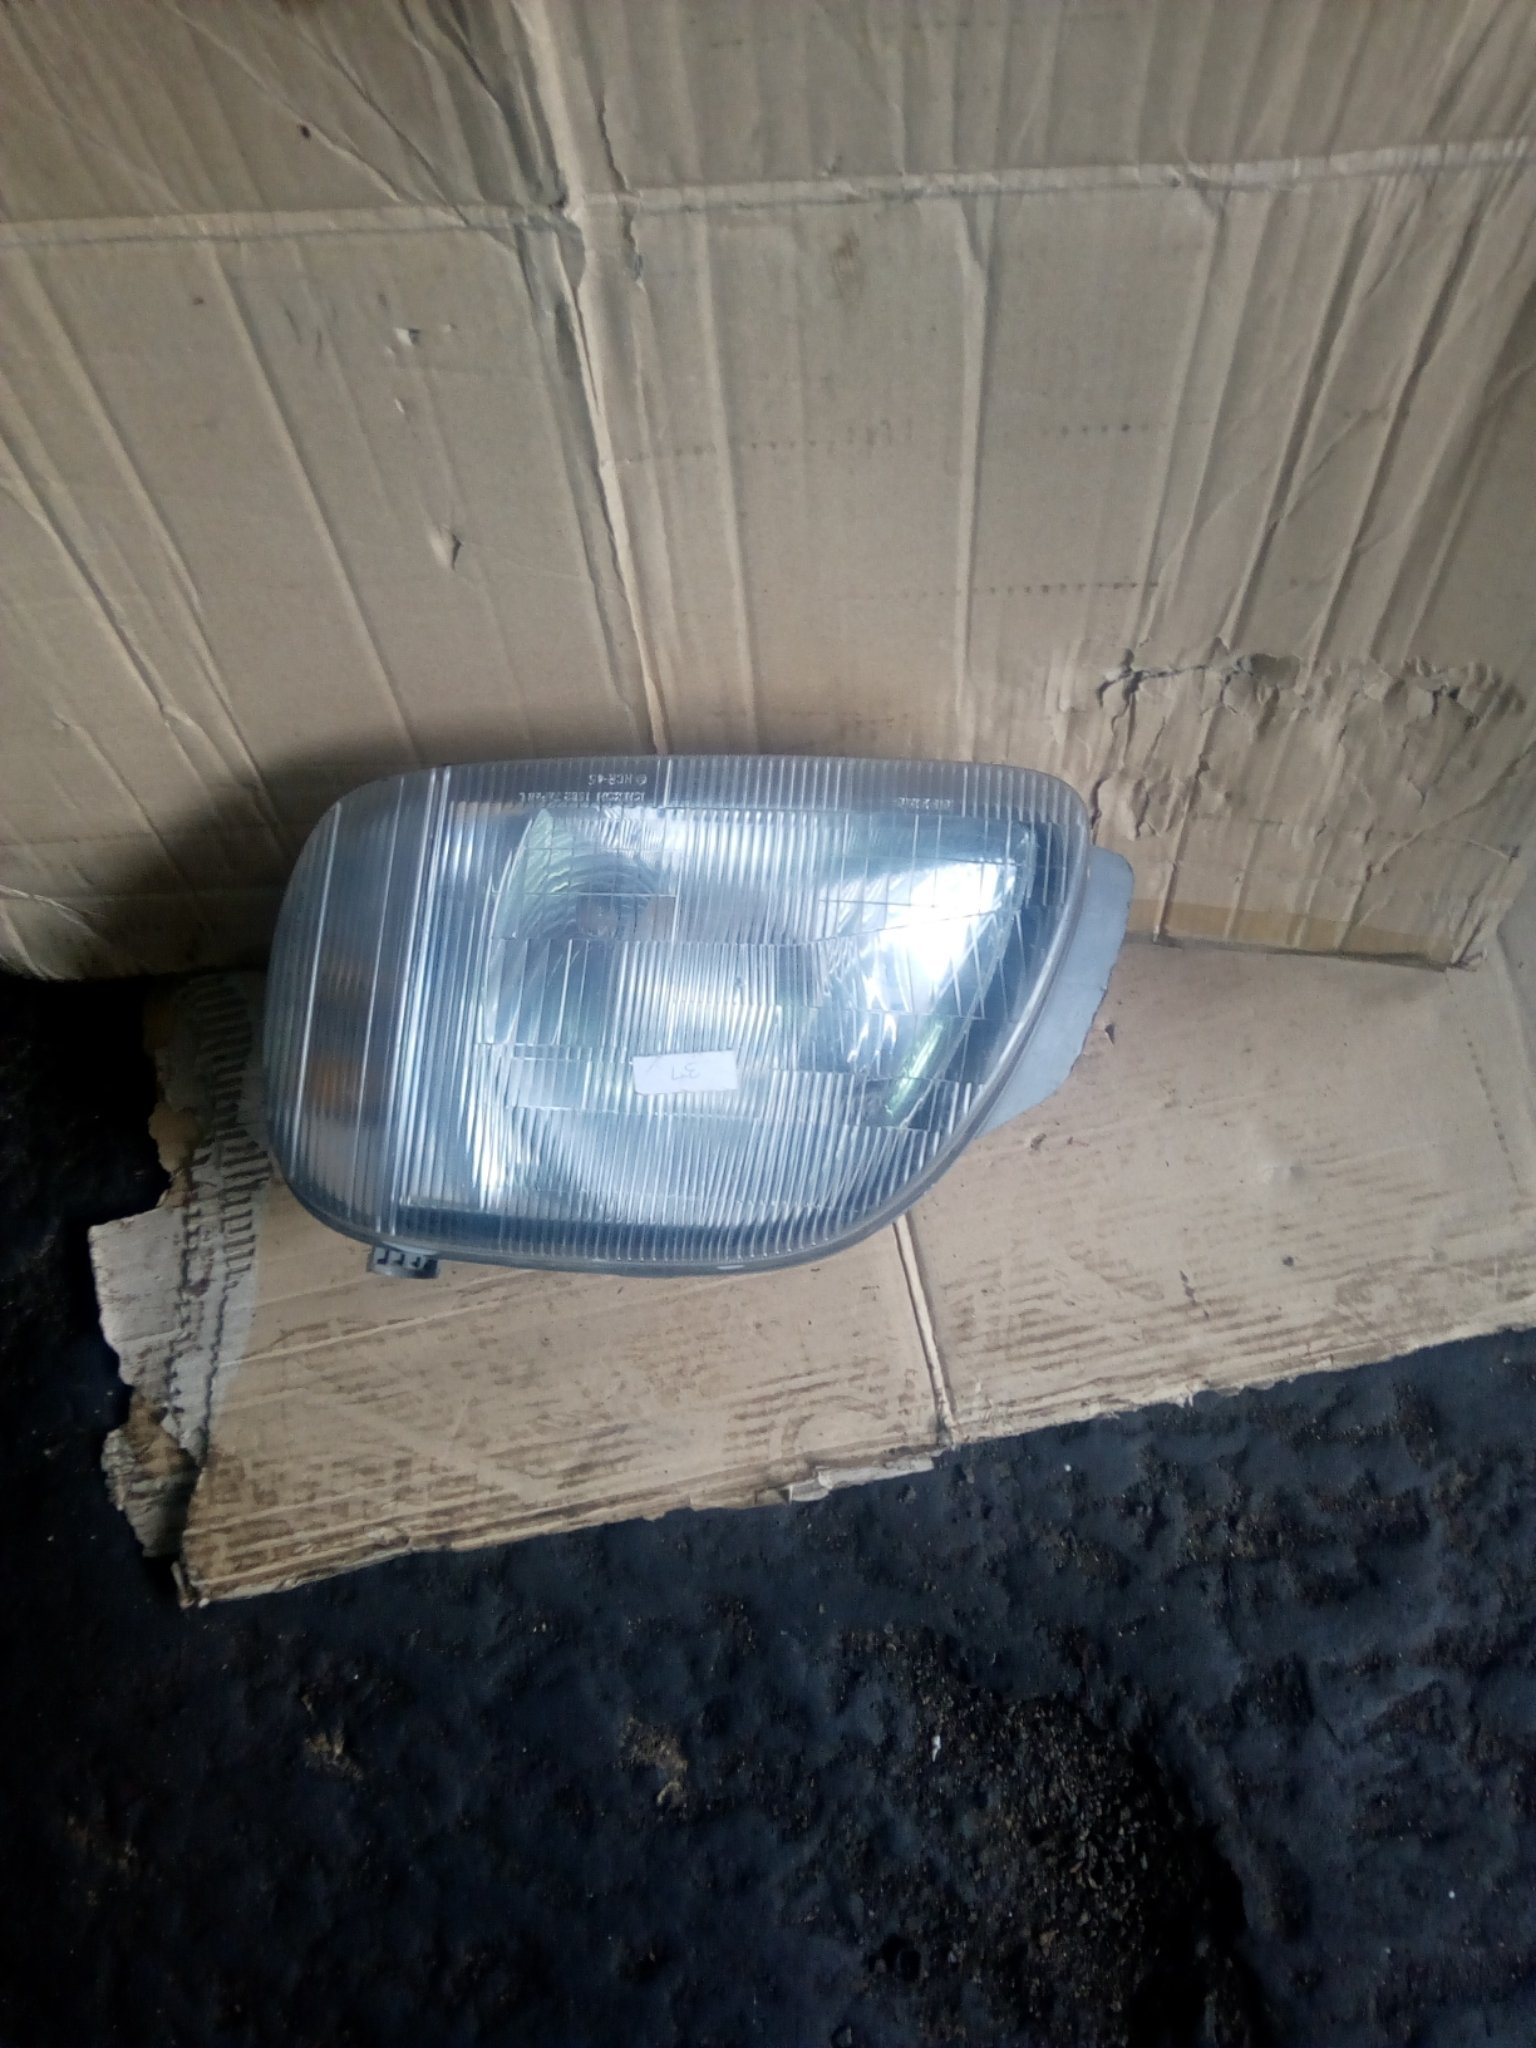 Nissan march headlight 00103